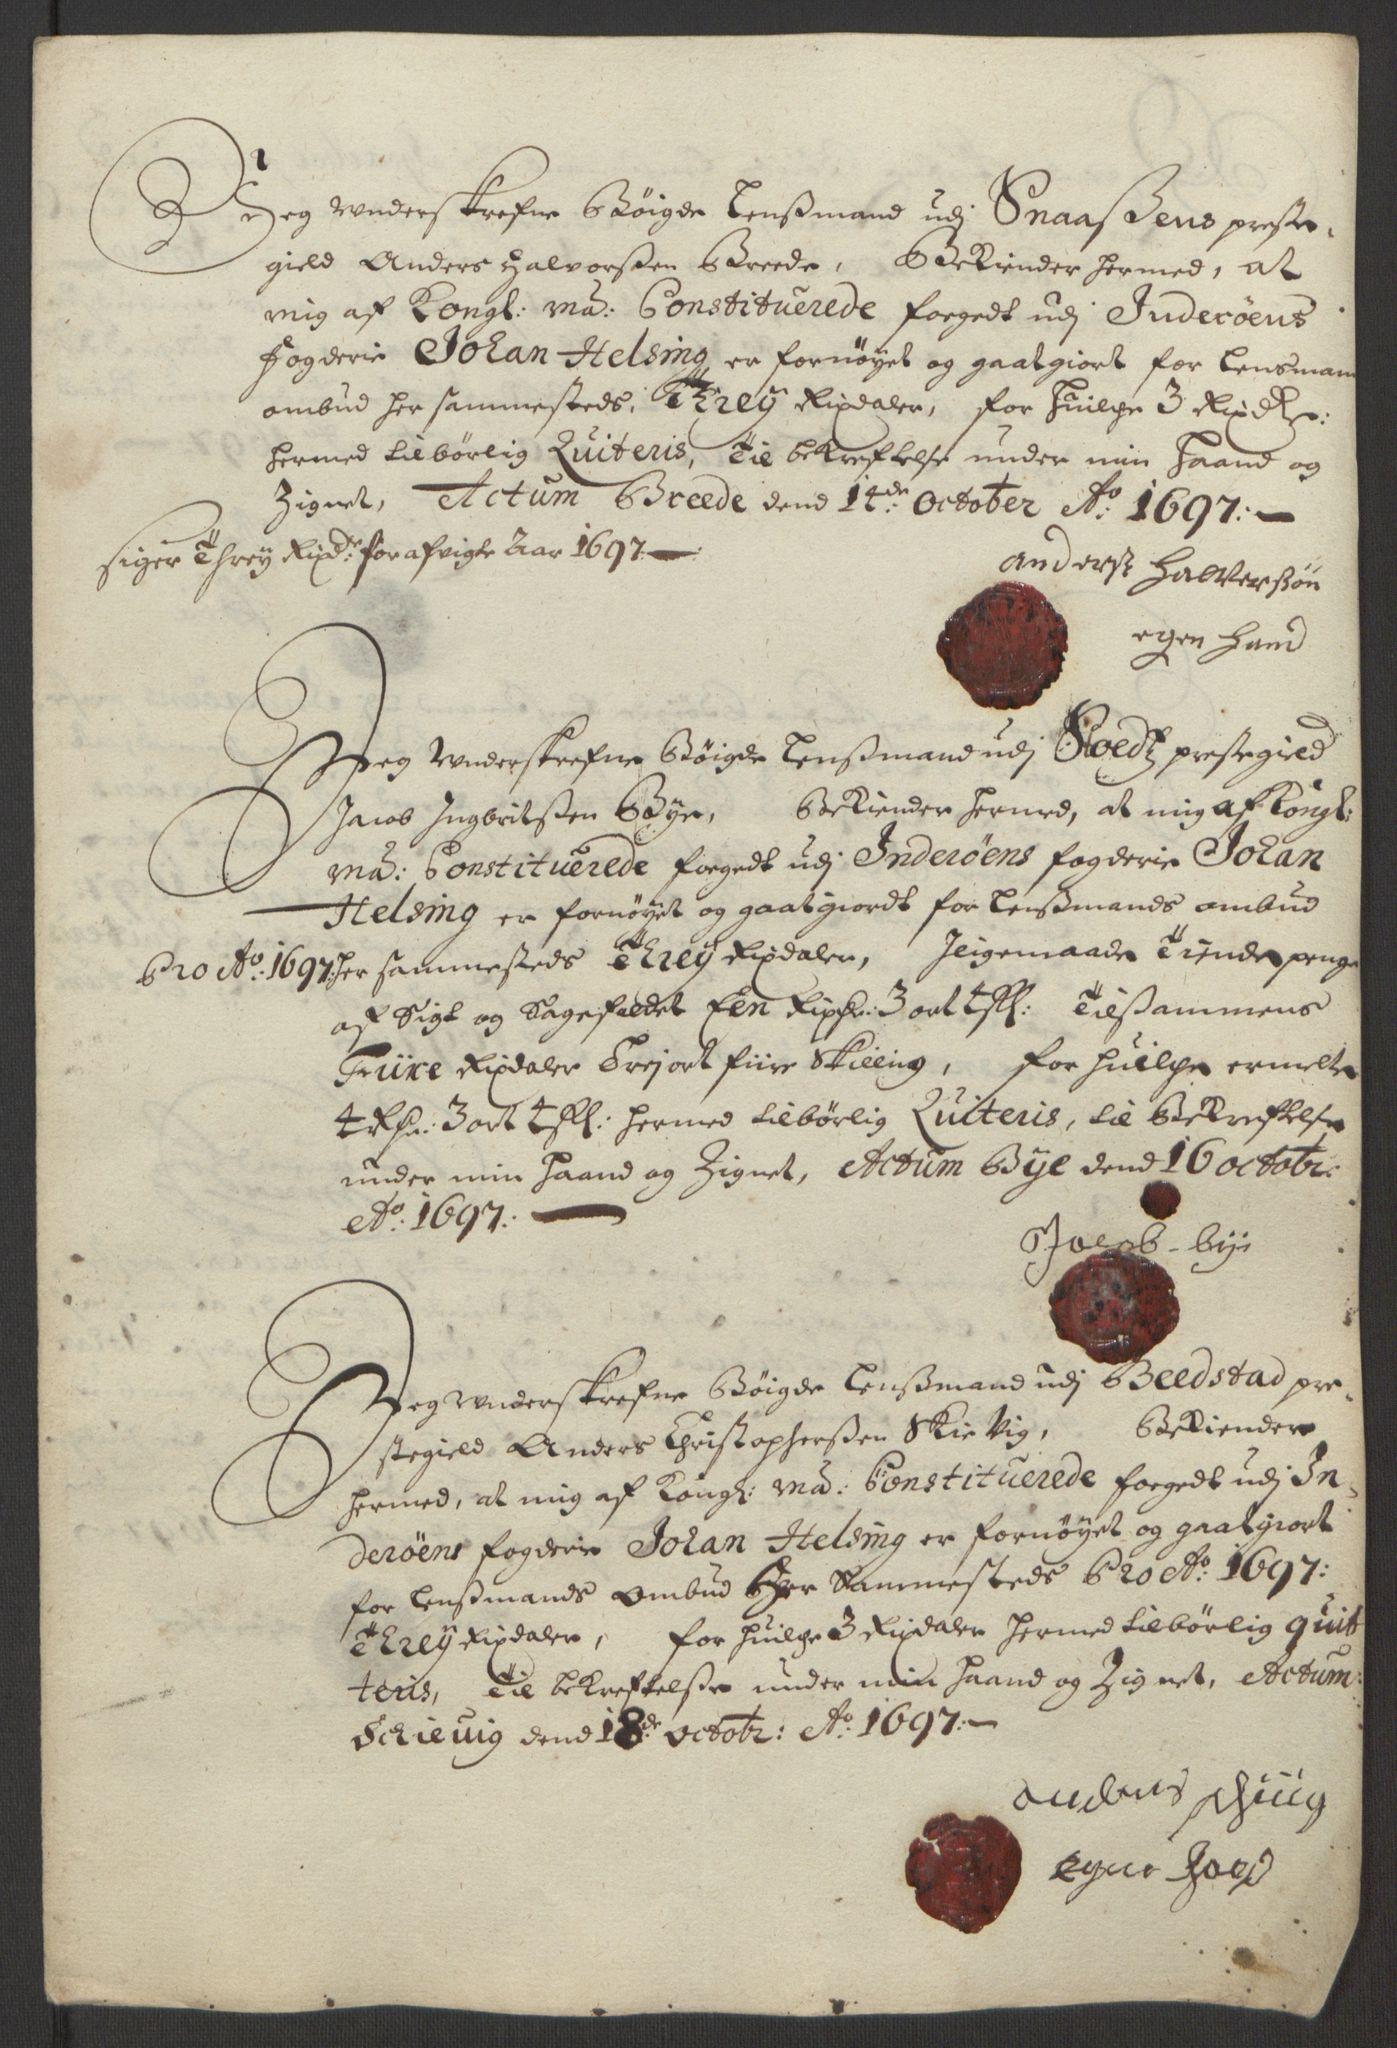 RA, Rentekammeret inntil 1814, Reviderte regnskaper, Fogderegnskap, R63/L4309: Fogderegnskap Inderøy, 1695-1697, s. 518